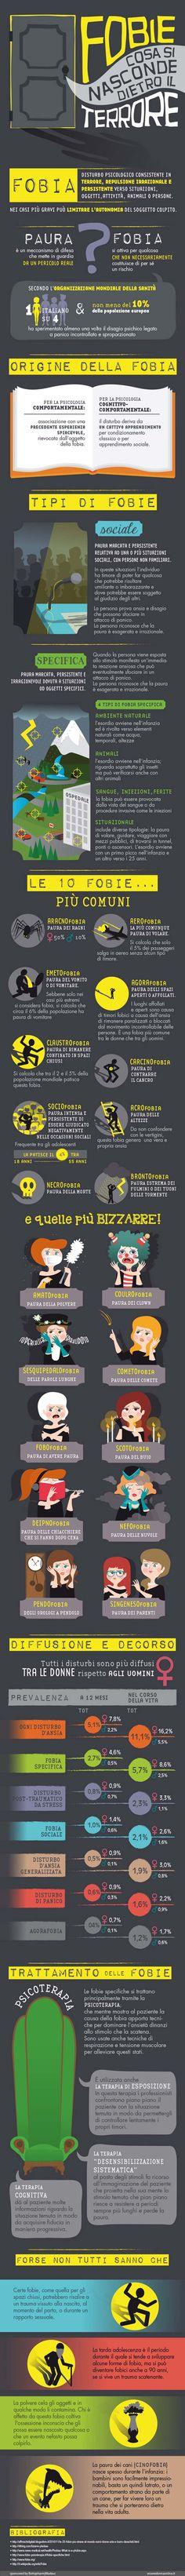 Infographic FOBIE COSA SI NASCONDE DIETRO IL TERRORE (PHOBIAS WHAT IS HIDING…